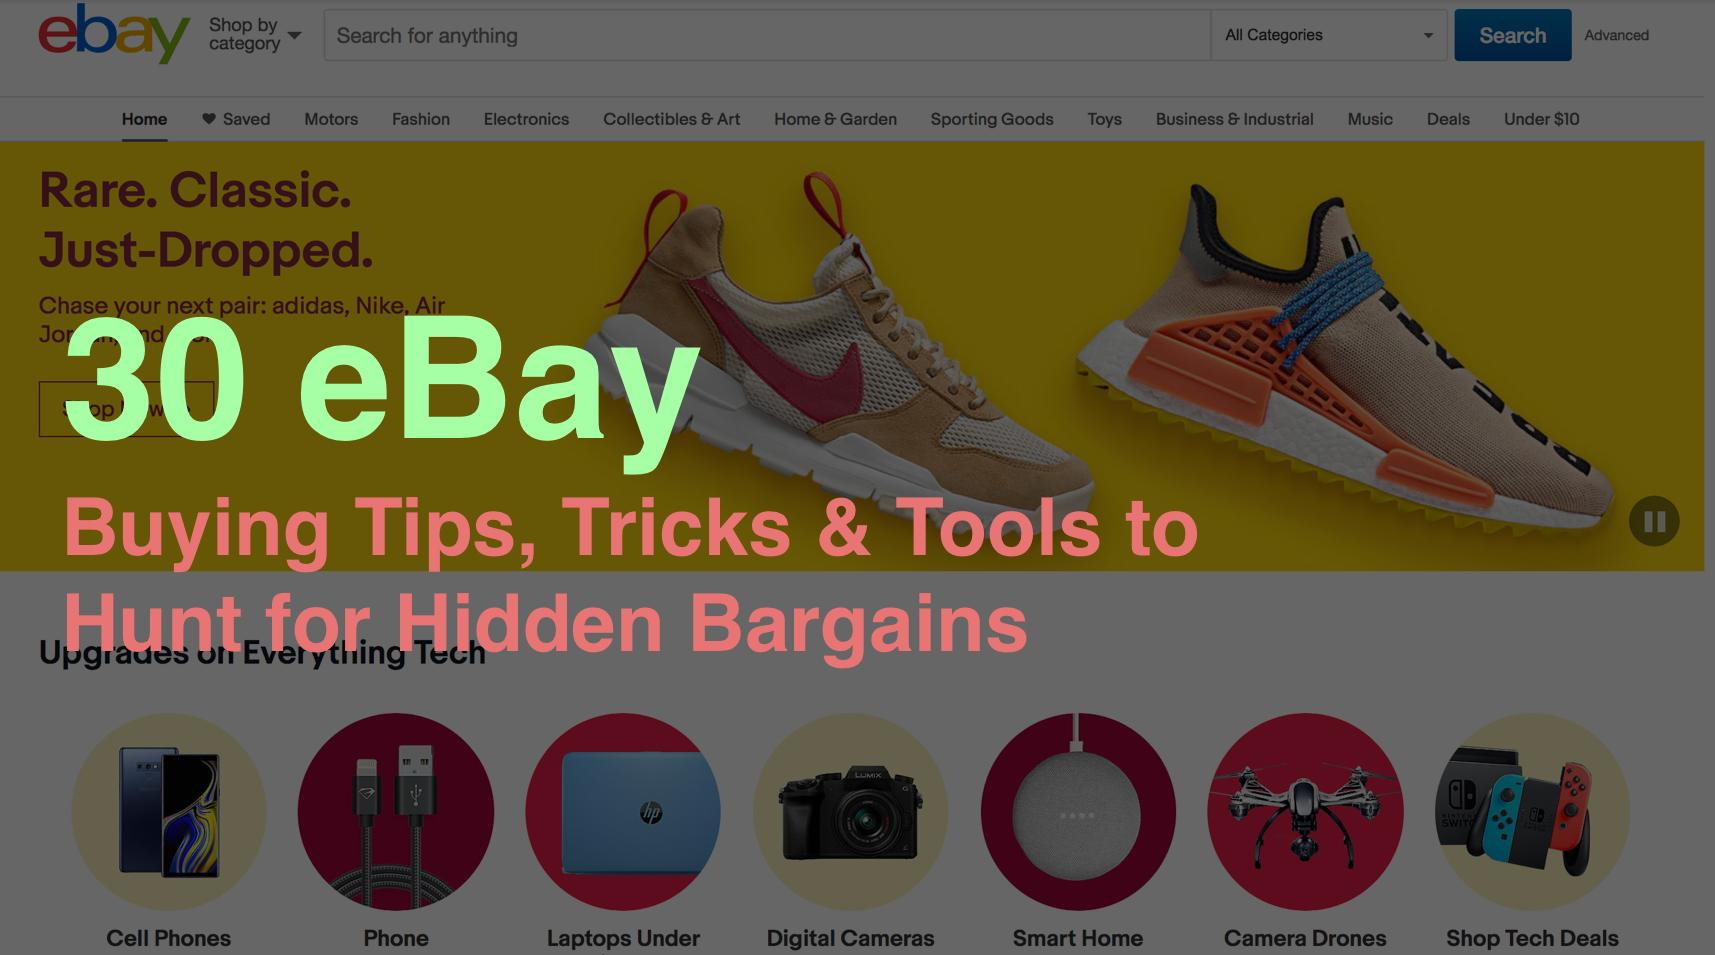 30 eBay Buying Tips, Tricks & Tools to Hunt for Hidden Bargains